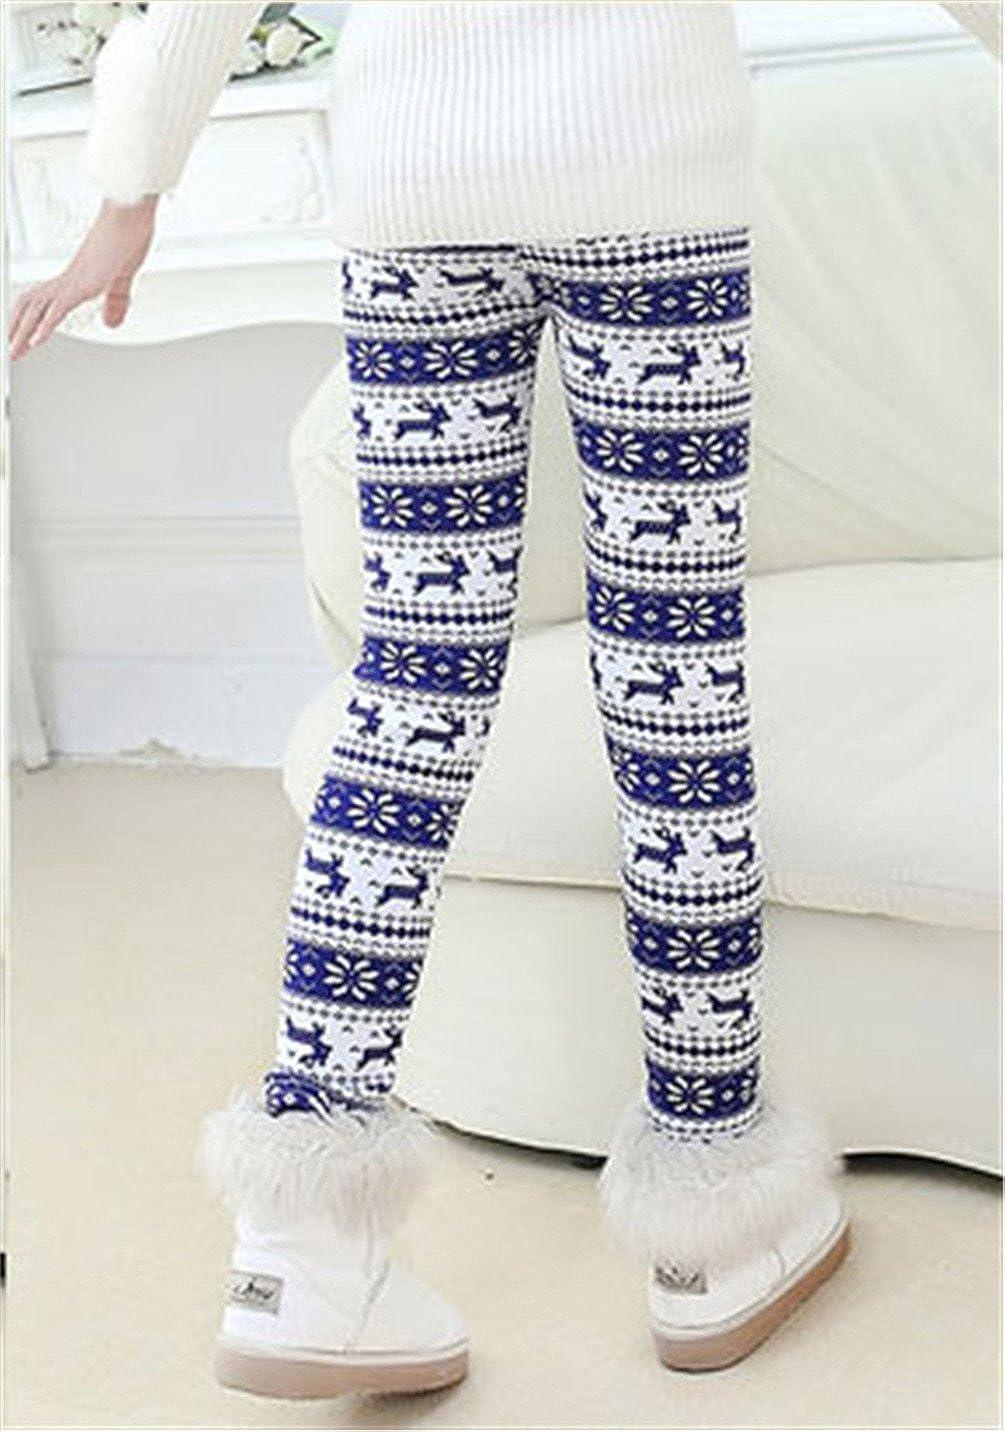 Rysly Girls Winter Thick Warm Long Pants Printing Fleece Lined Leggings 150 Blue elk